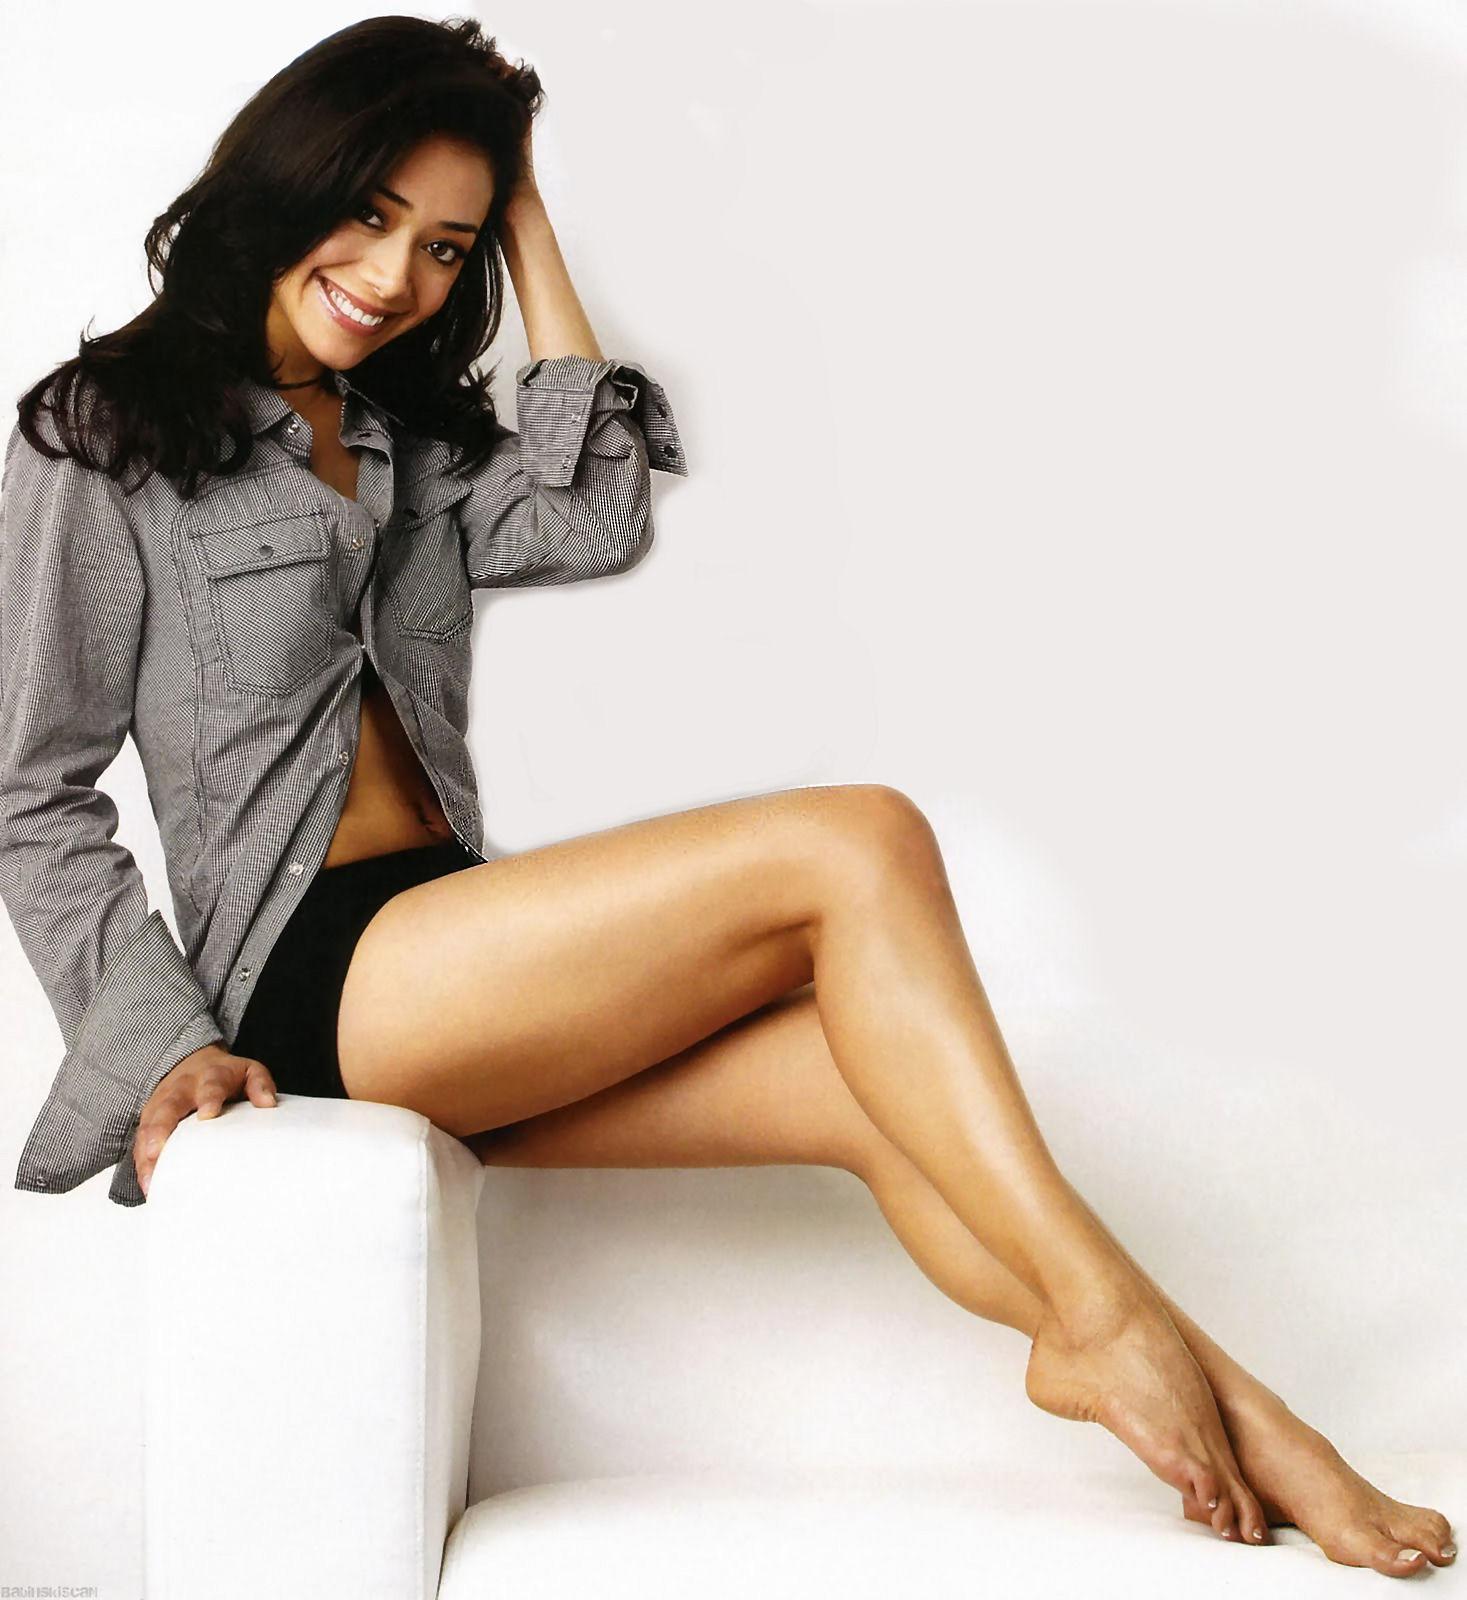 Aimee garcia hot